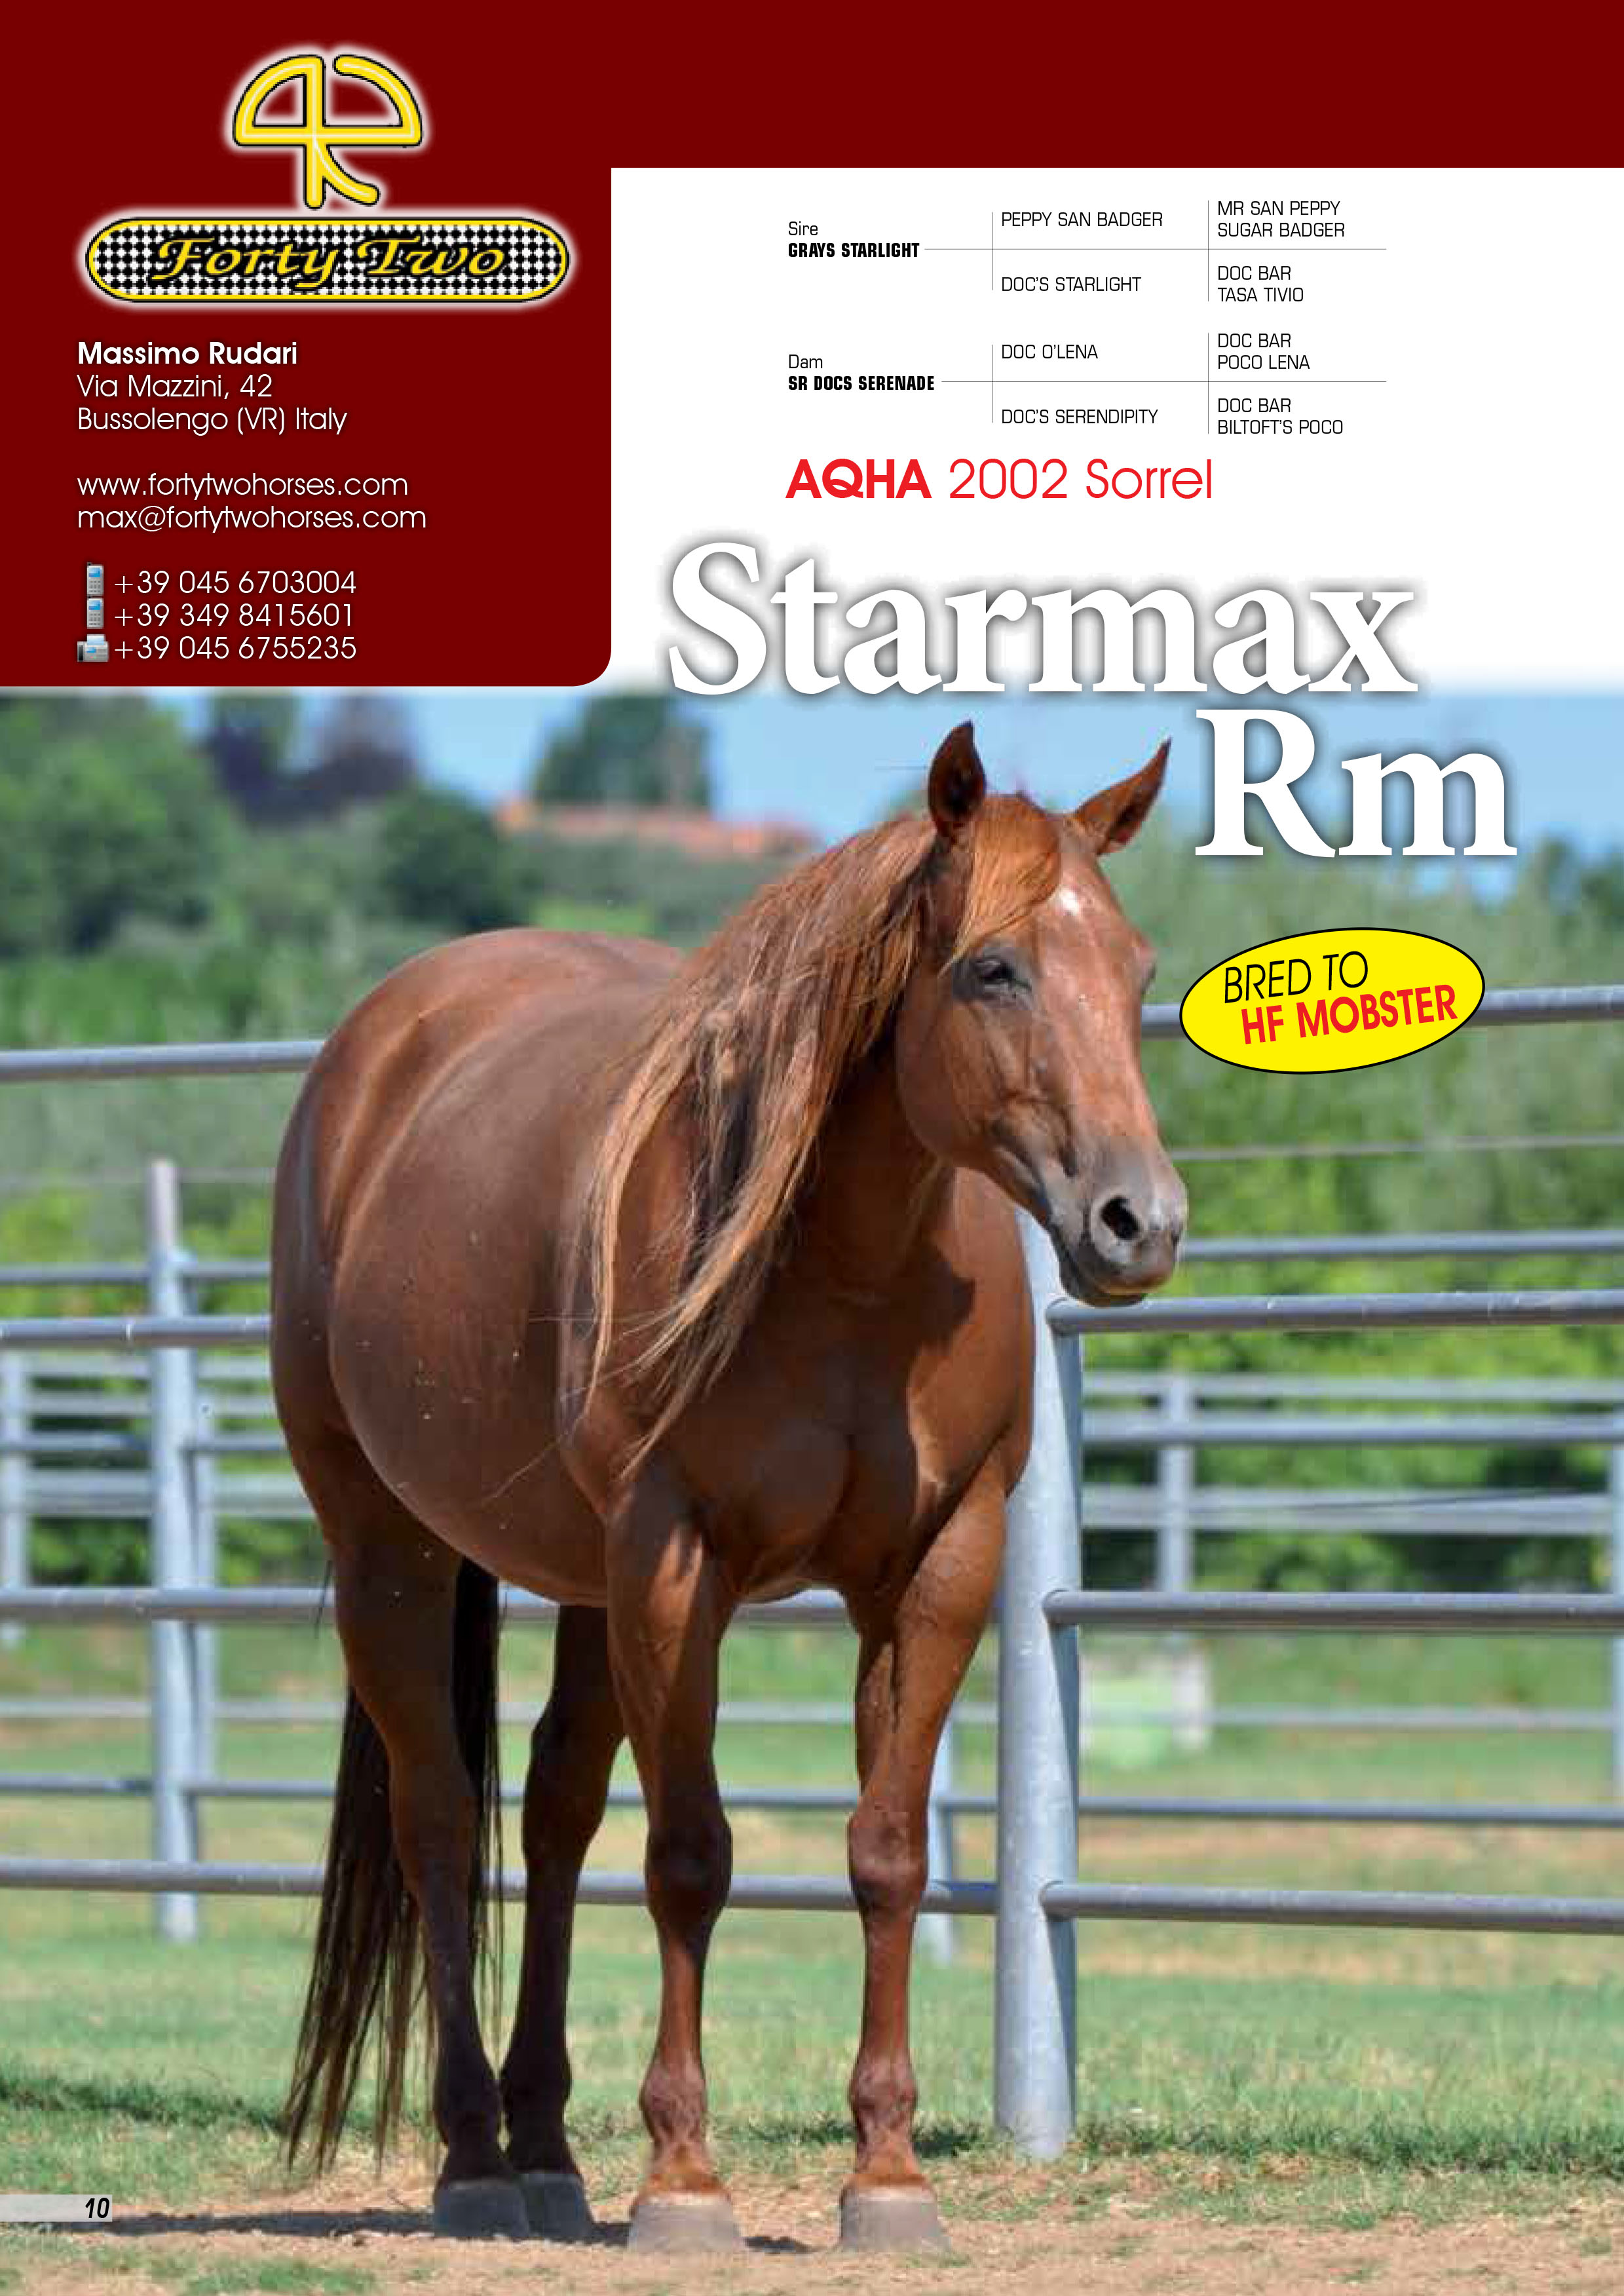 Starmax RM